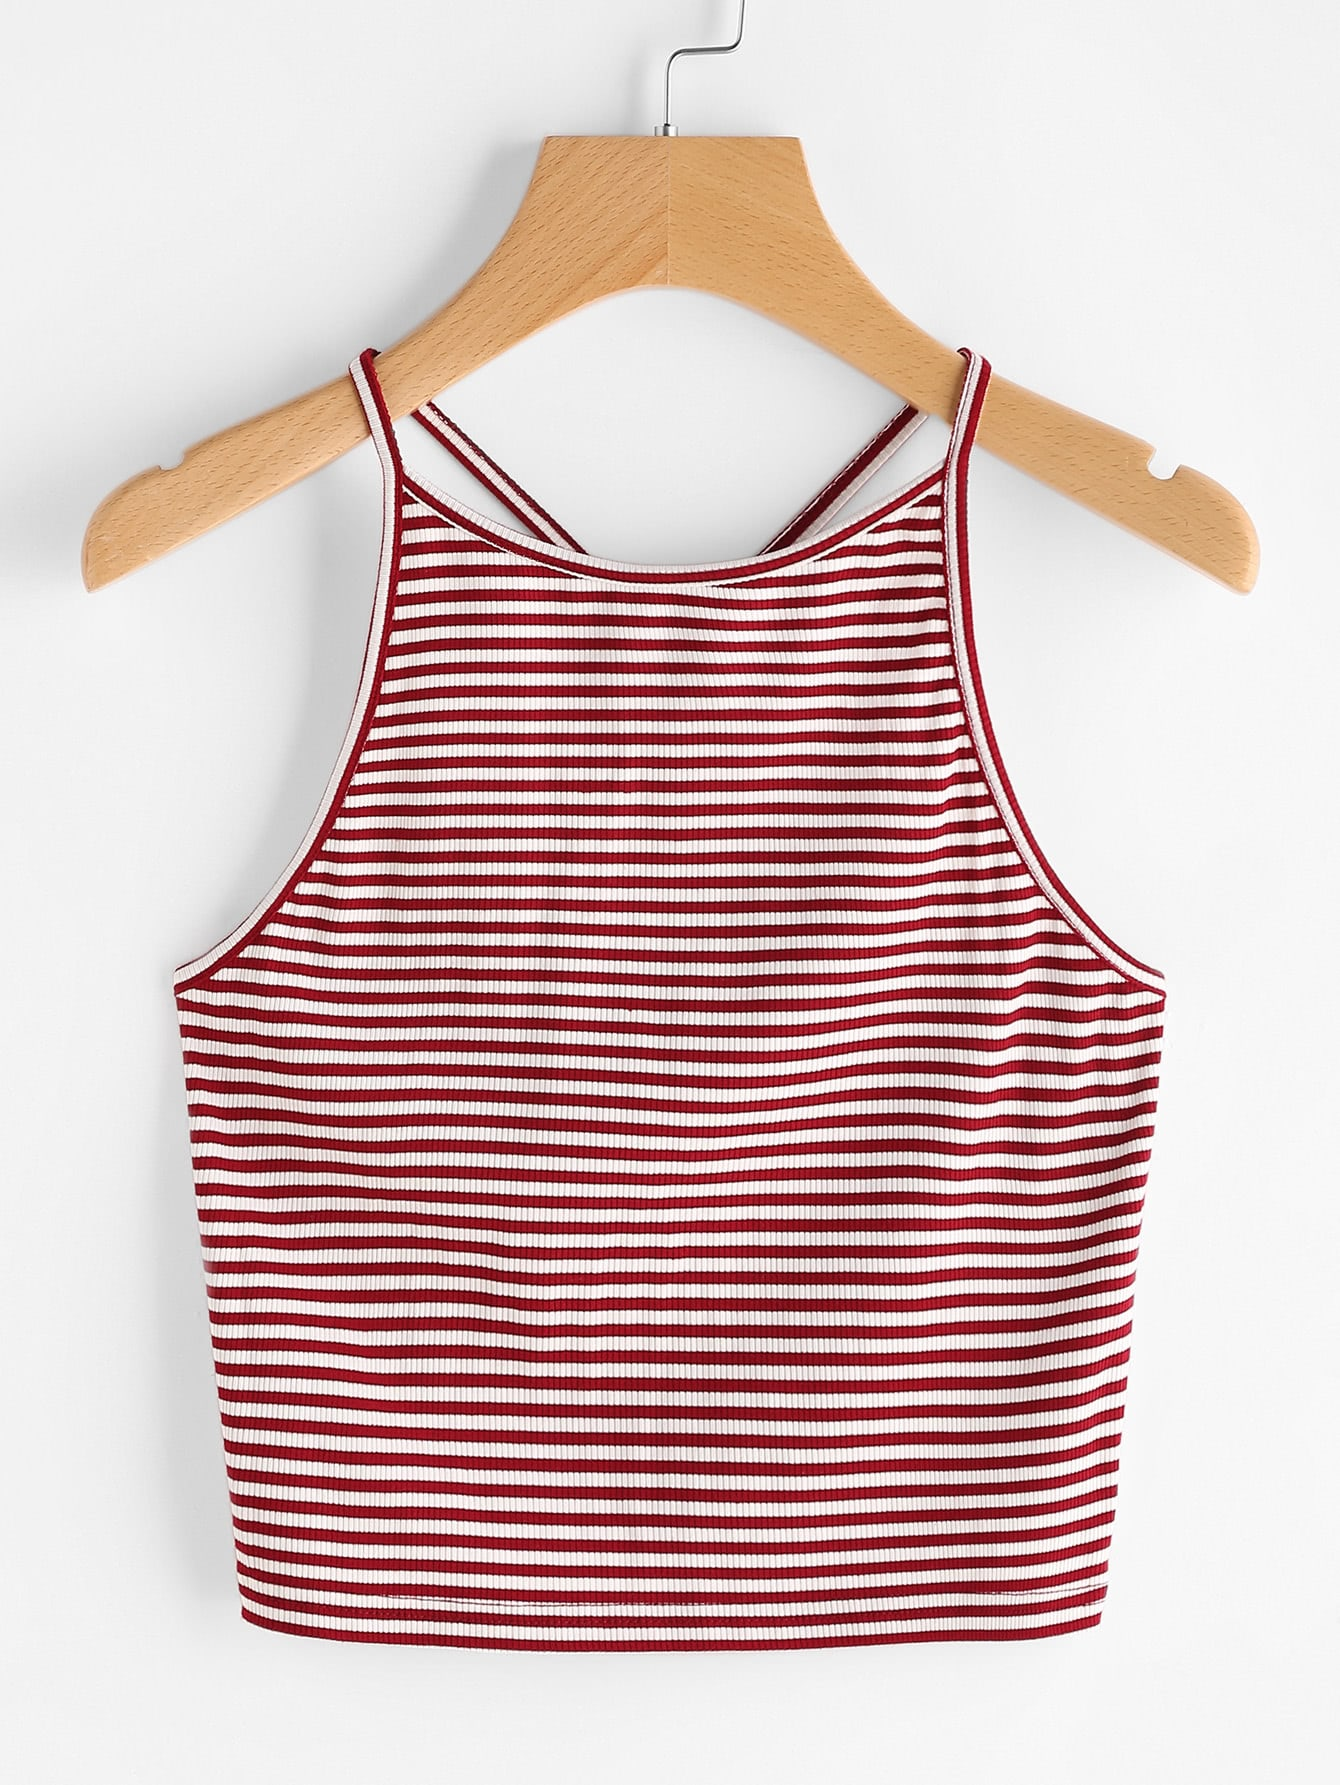 Pinstripe Criss Cross Back Cami Top vest170407002